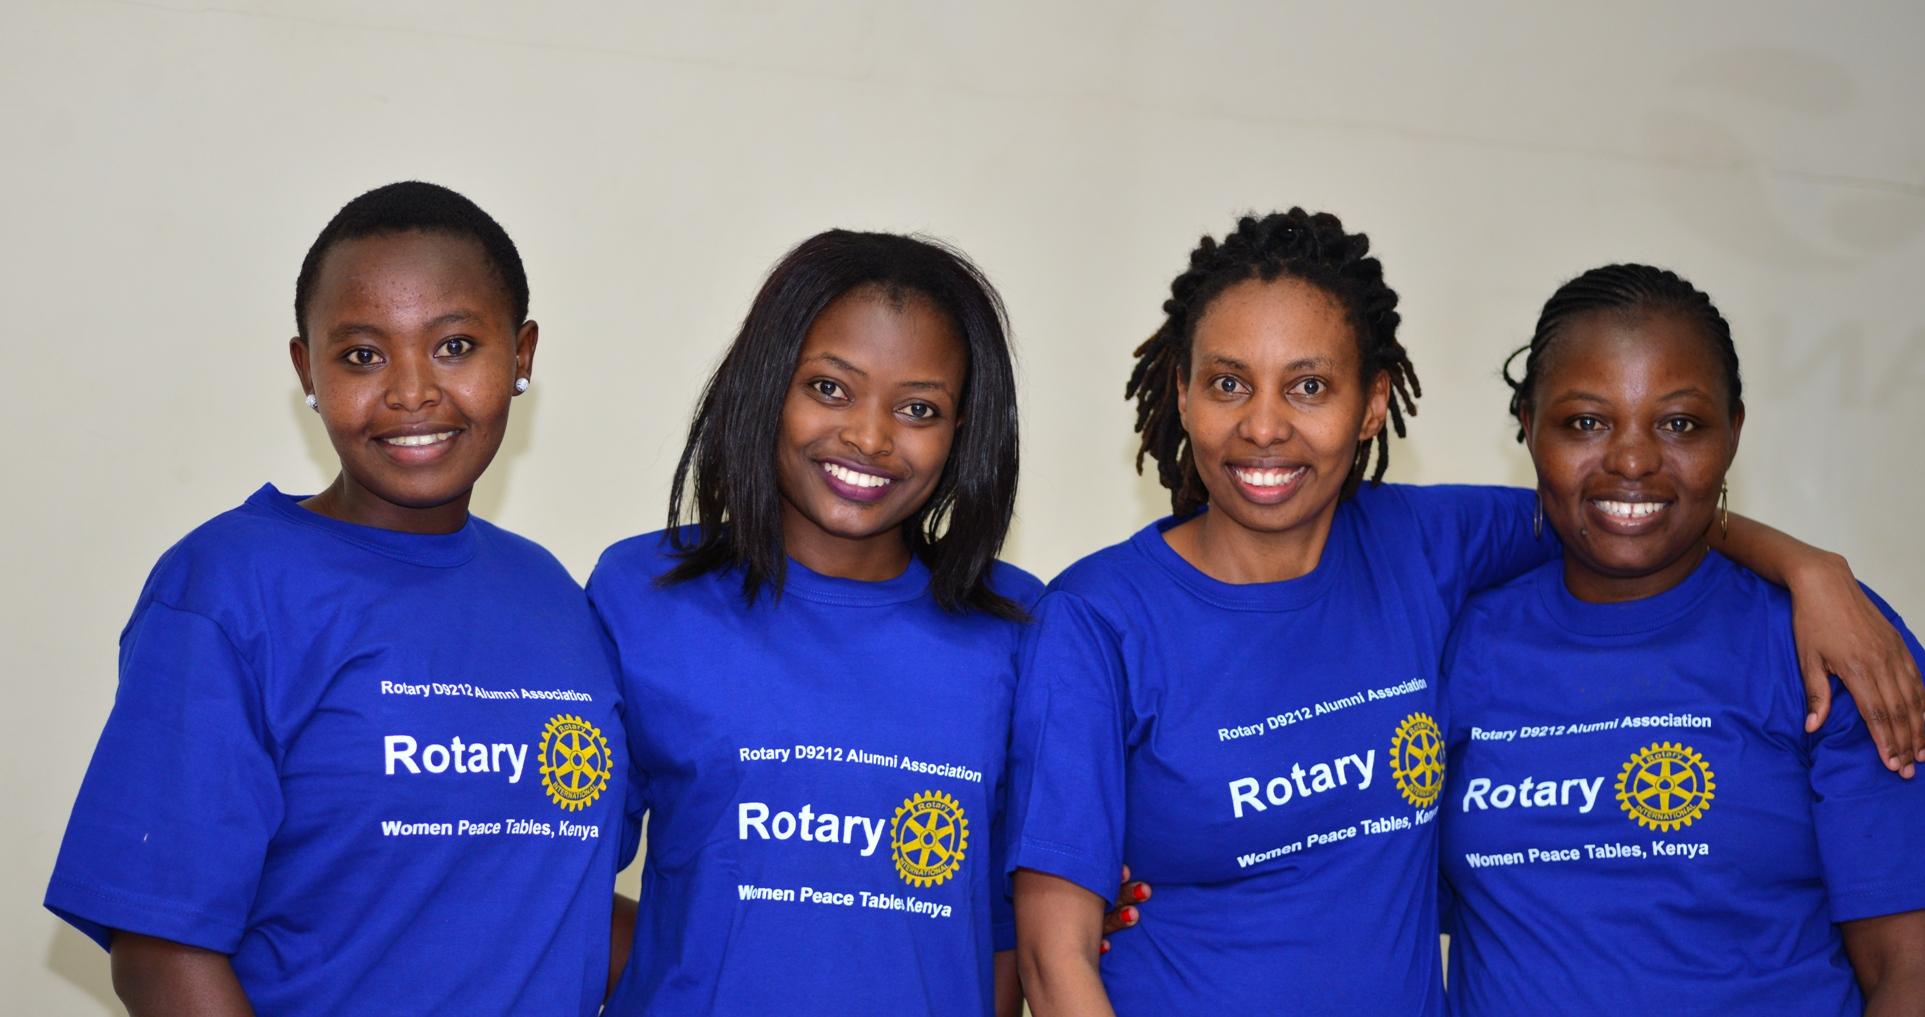 Rotary Peace Fellows Alumni-Kenya Chapter